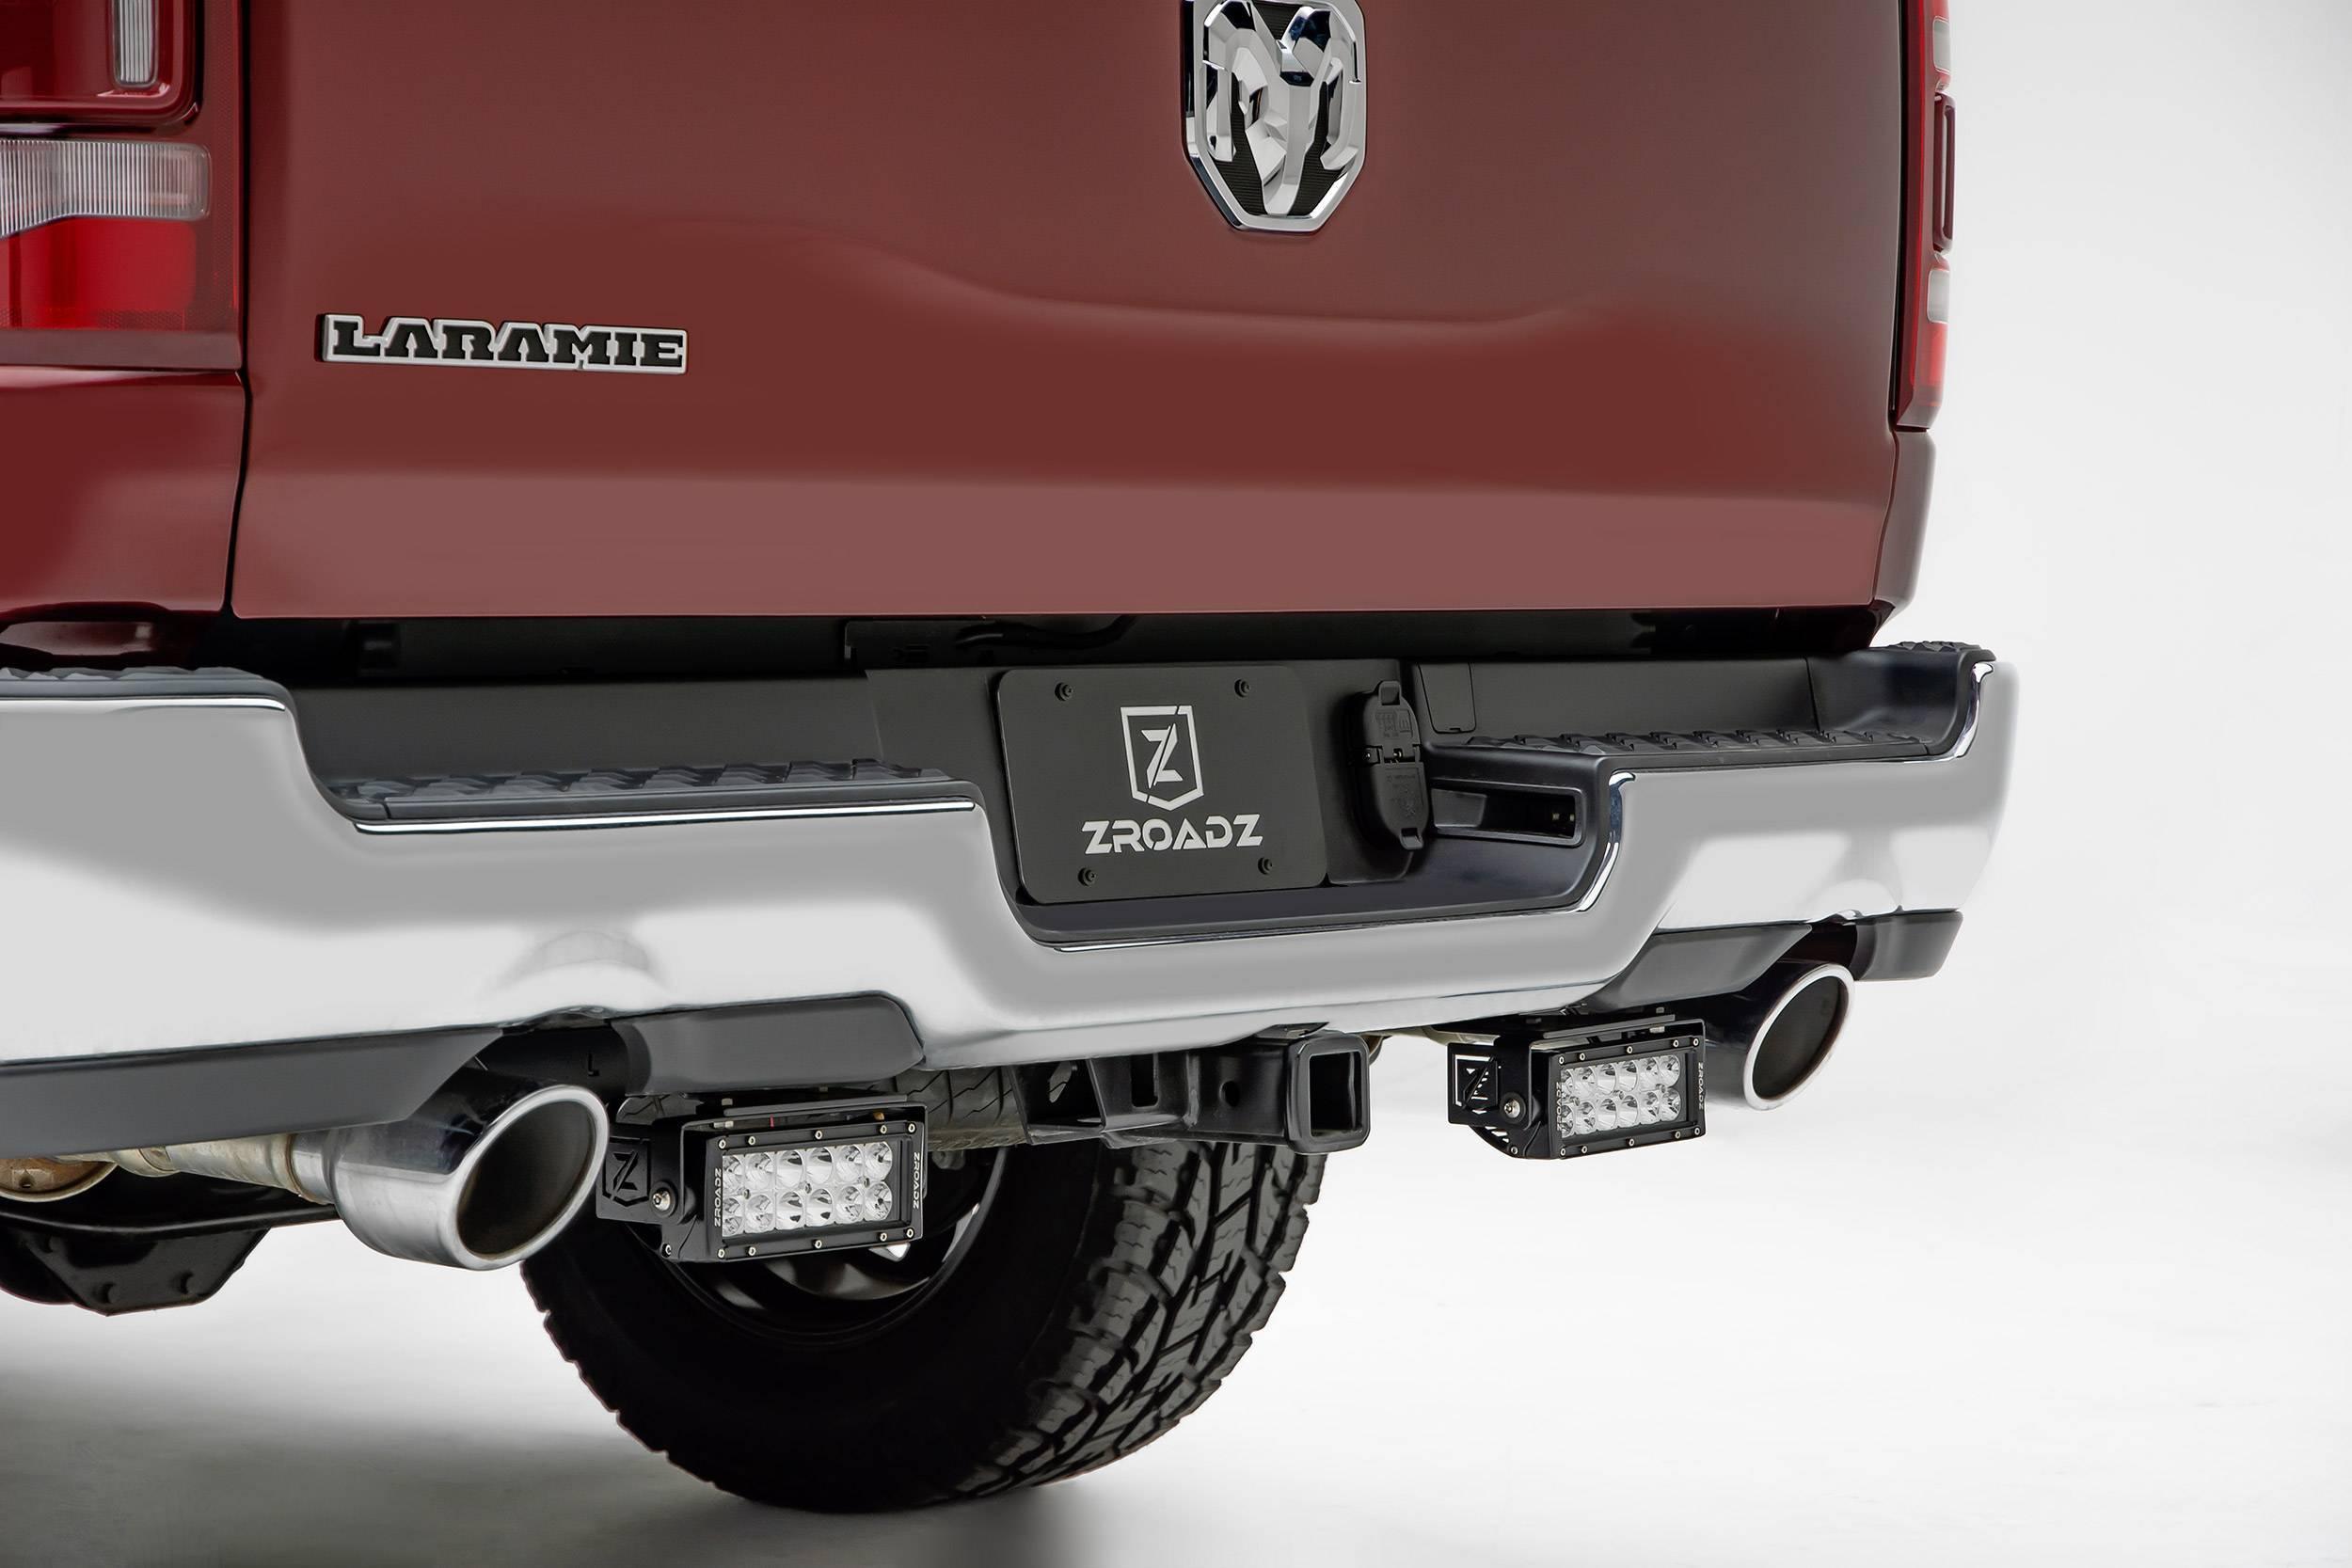 ZROADZ - 2019-2021 Ram 1500 Rear Bumper LED Kit with (2) 6 Inch LED Straight Double Row Light Bars - PN #Z384721-KIT